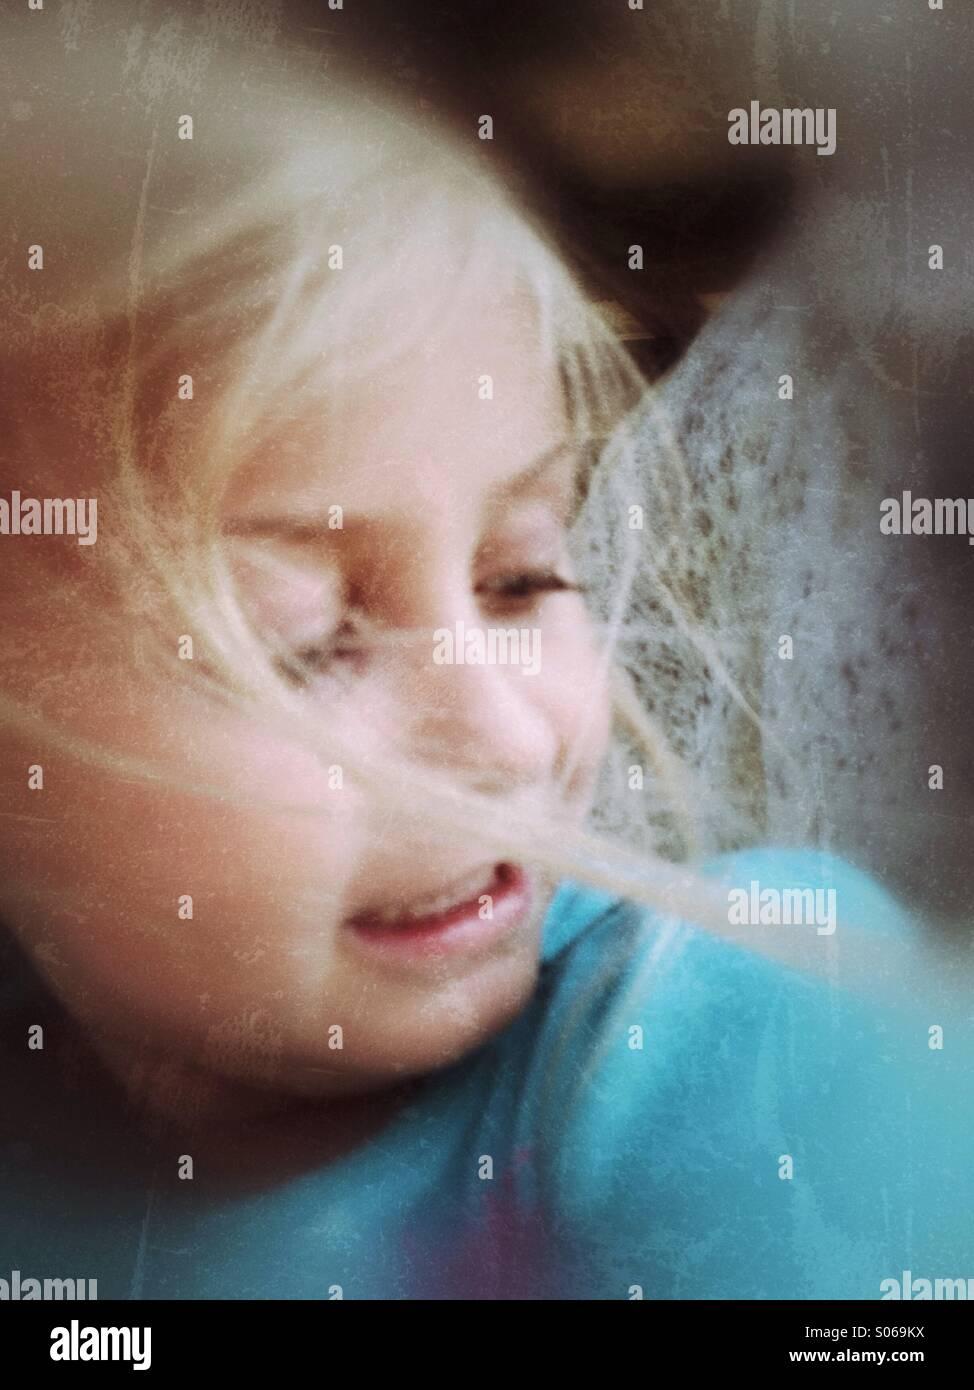 Closeness. - Stock Image